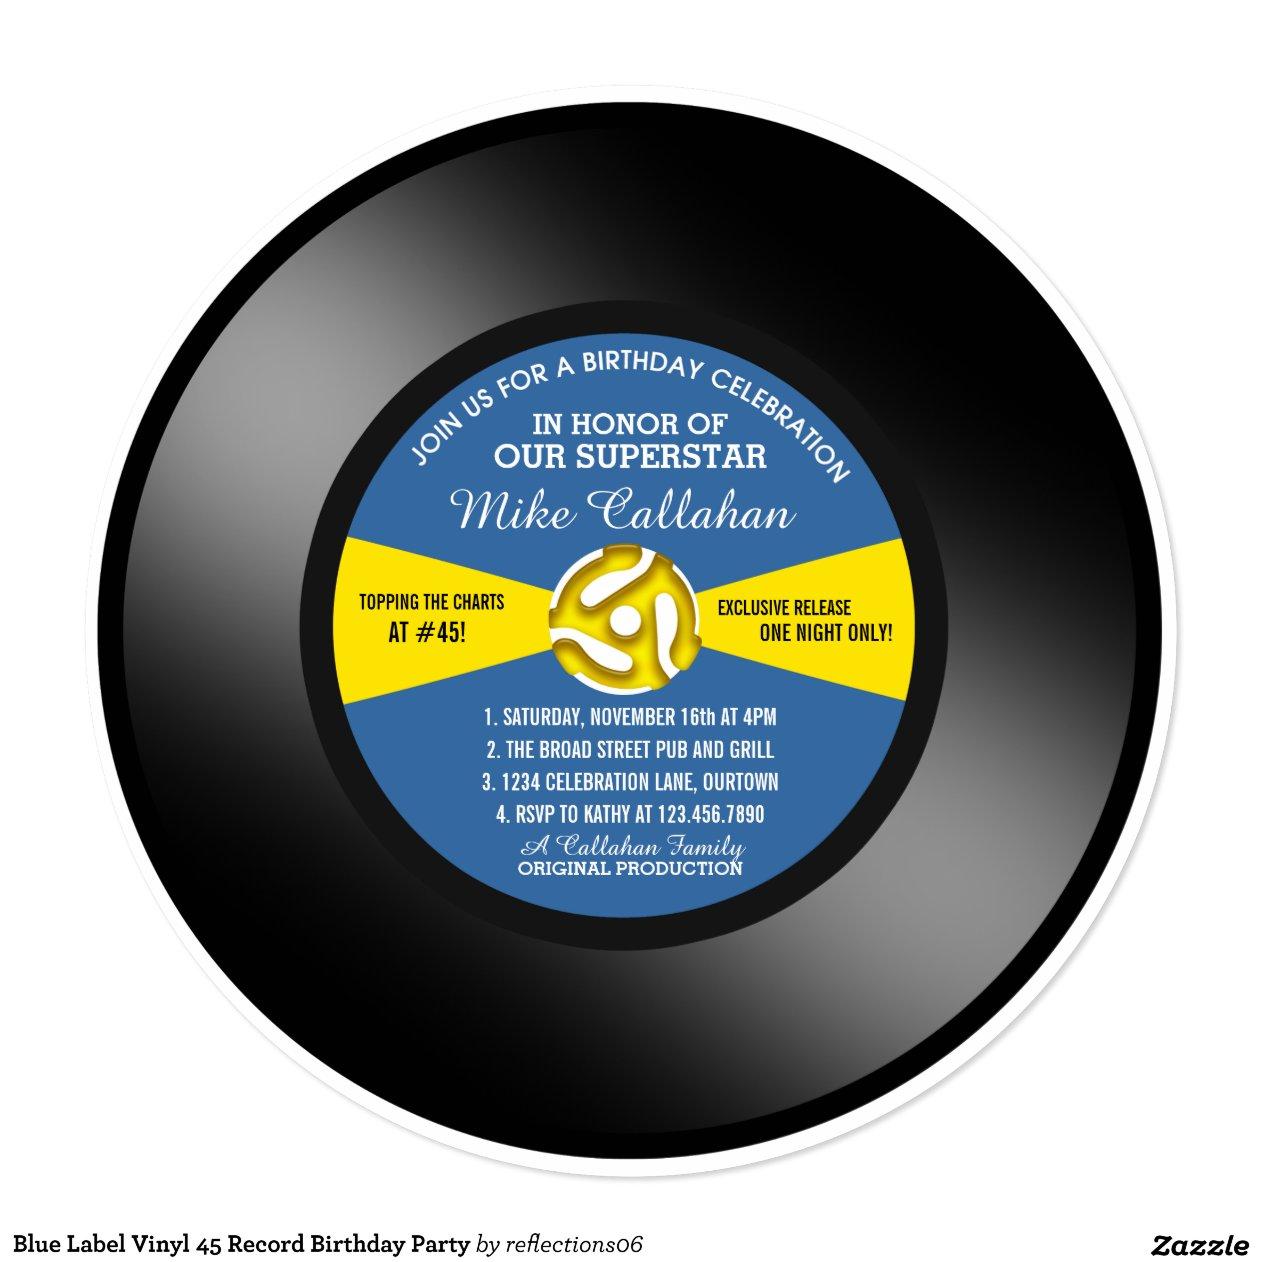 Vinyl Record Invitations is Inspirational Ideas To Make Luxury Invitations Card